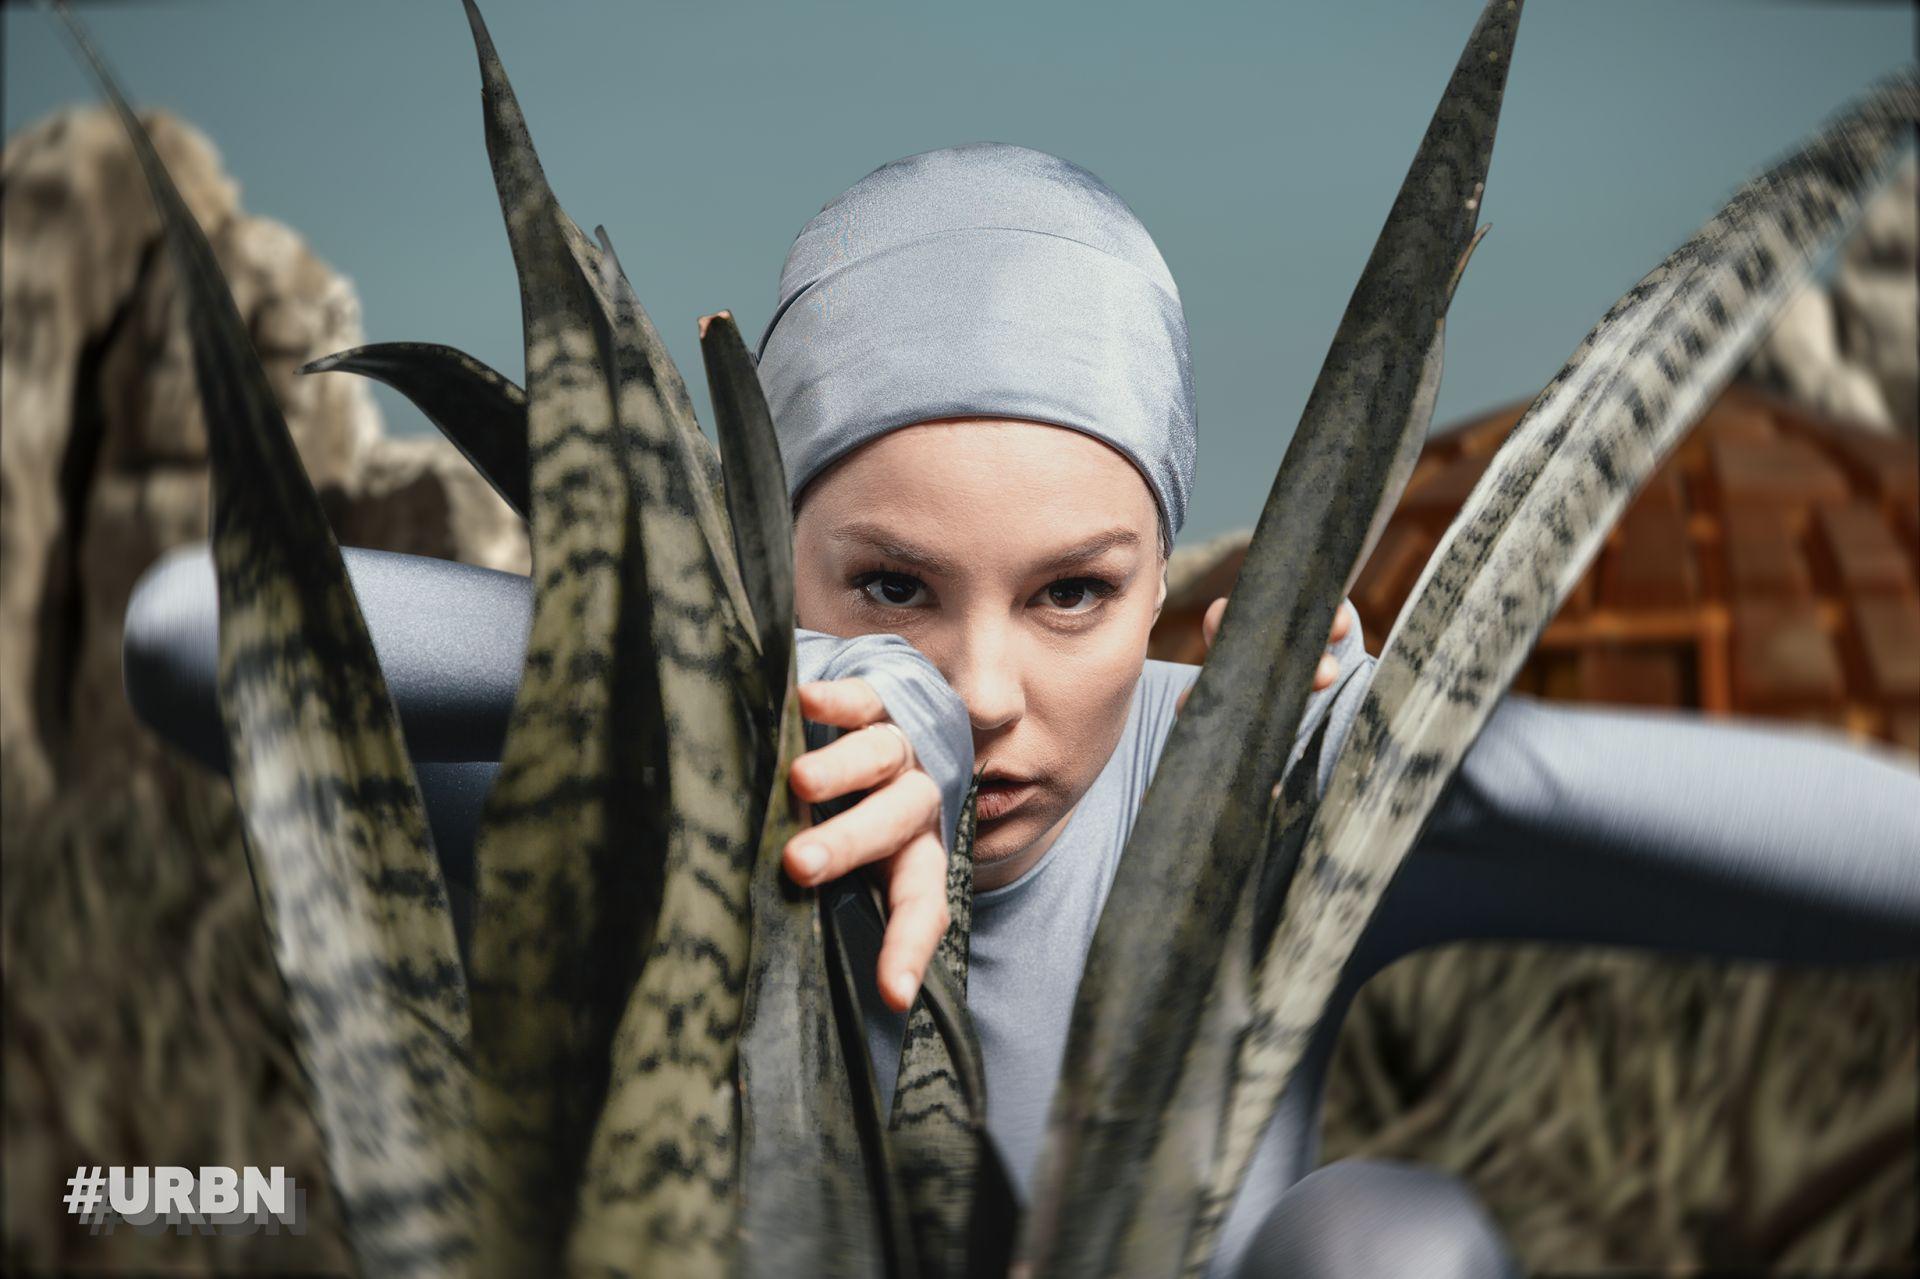 Ива Янкулова //Фотография: Десислава Генкова - Елриша за #URBN// 3D ефекти: Ivan Tride// Гардероб: Александрина Дременджийска & Zero-Tags